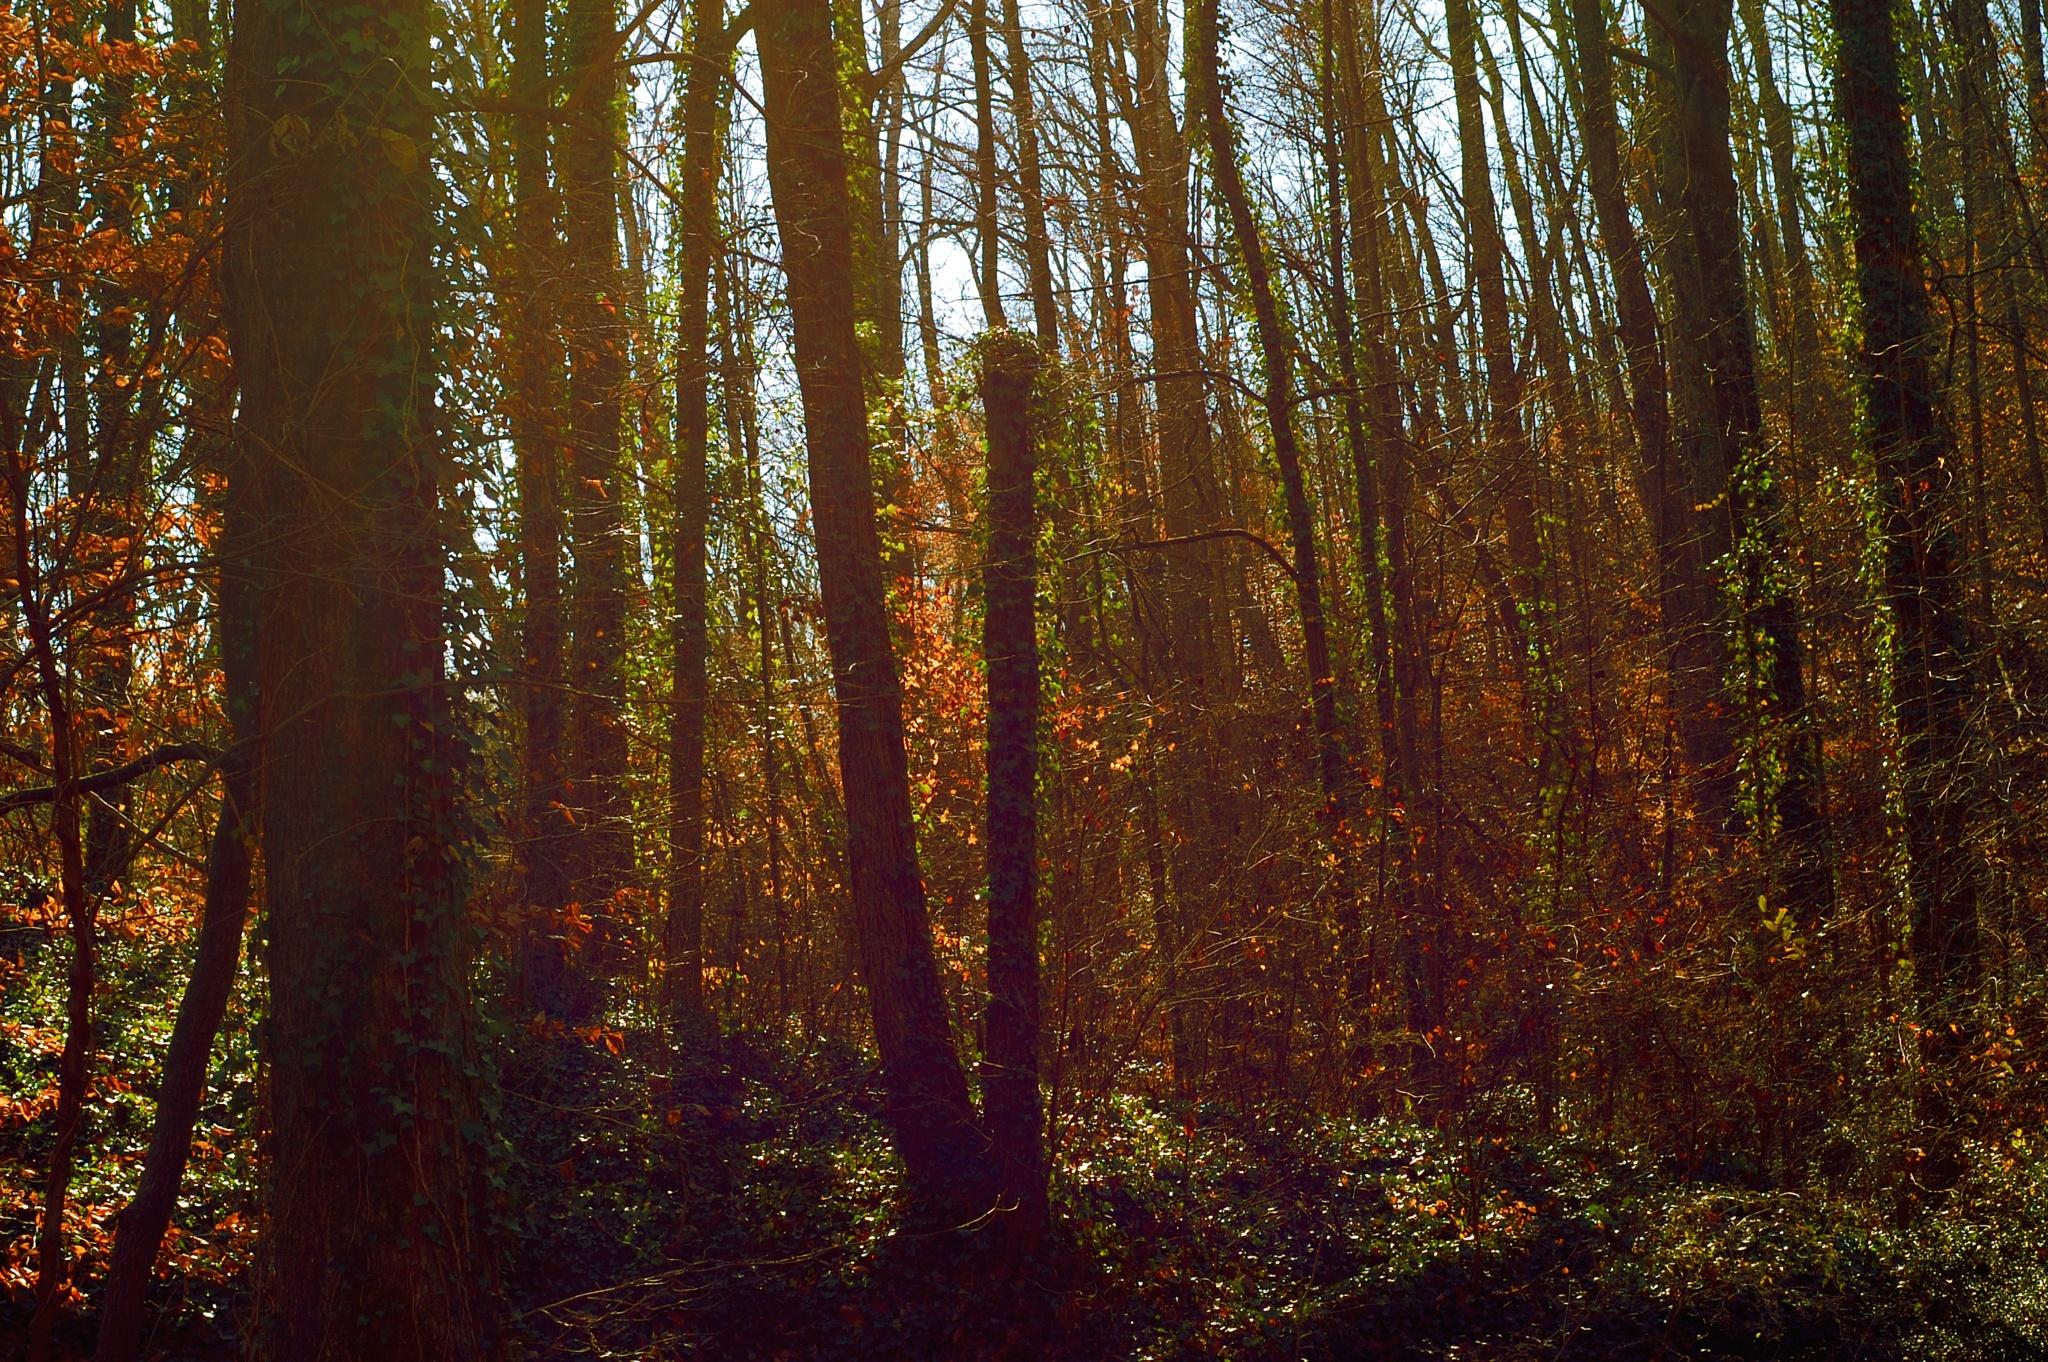 Ah..smokey forest by Yoko D